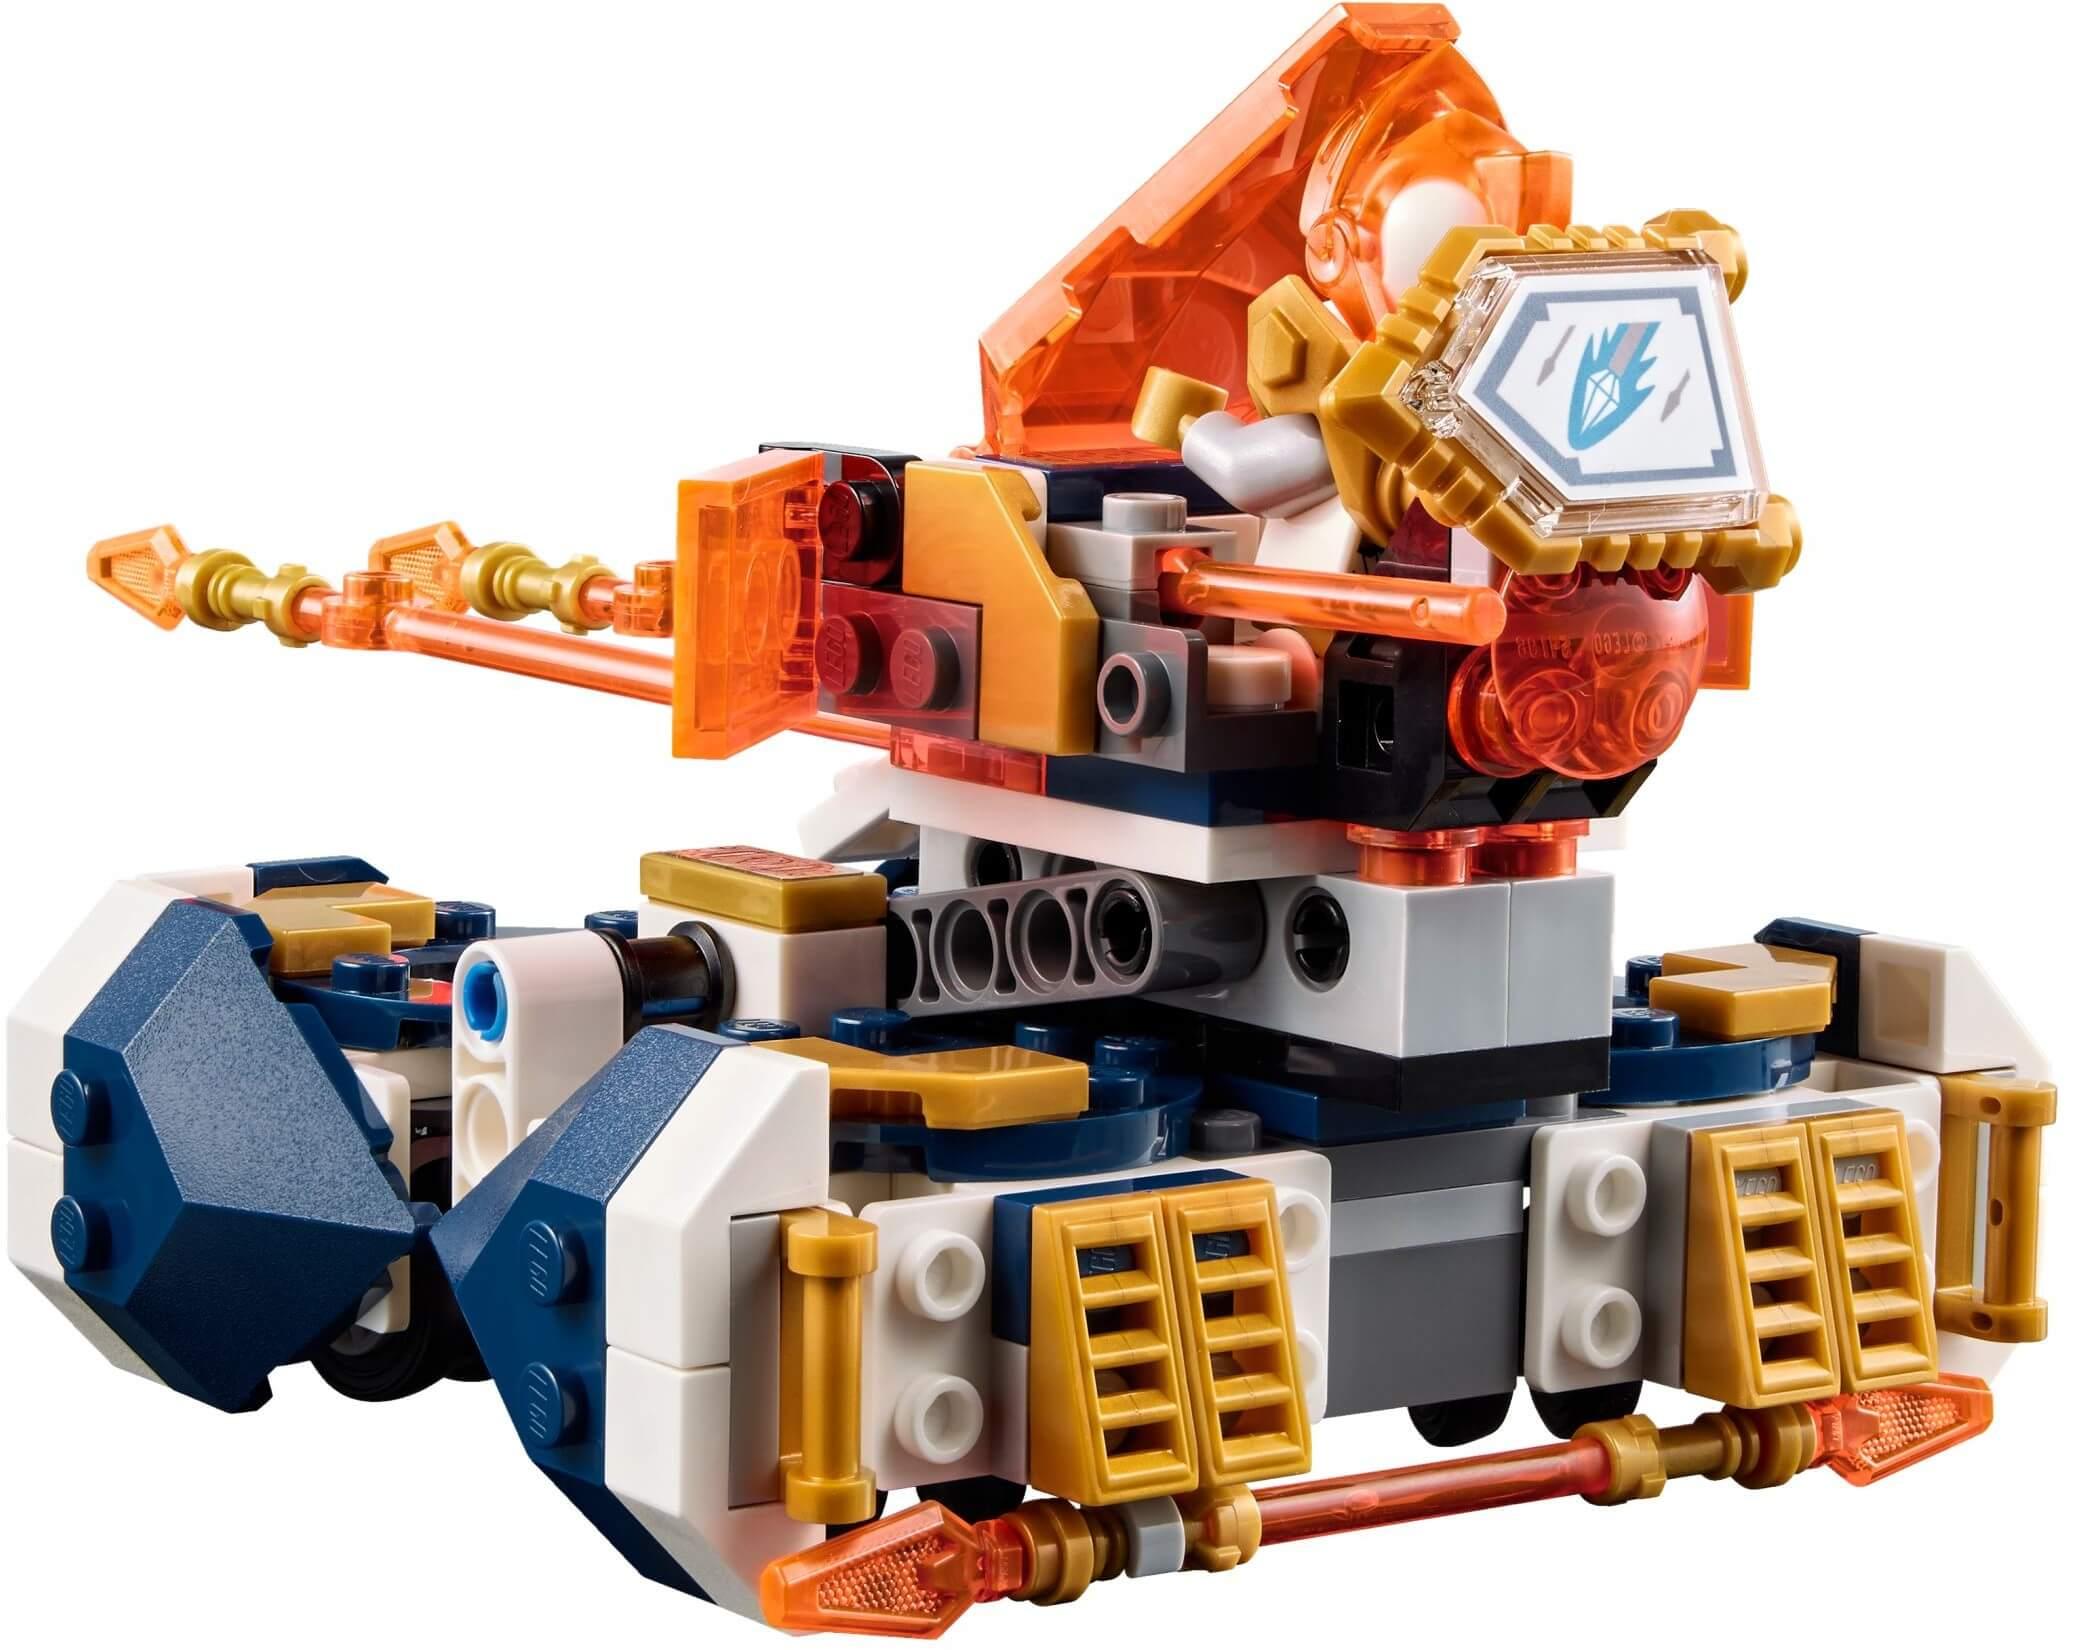 Mua đồ chơi LEGO 72001 - LEGO Nexo Knights 72001 - Cỗ máy phóng Lao của Lance (LEGO Nexo Knights 72001 Lance's Hover Jouster)